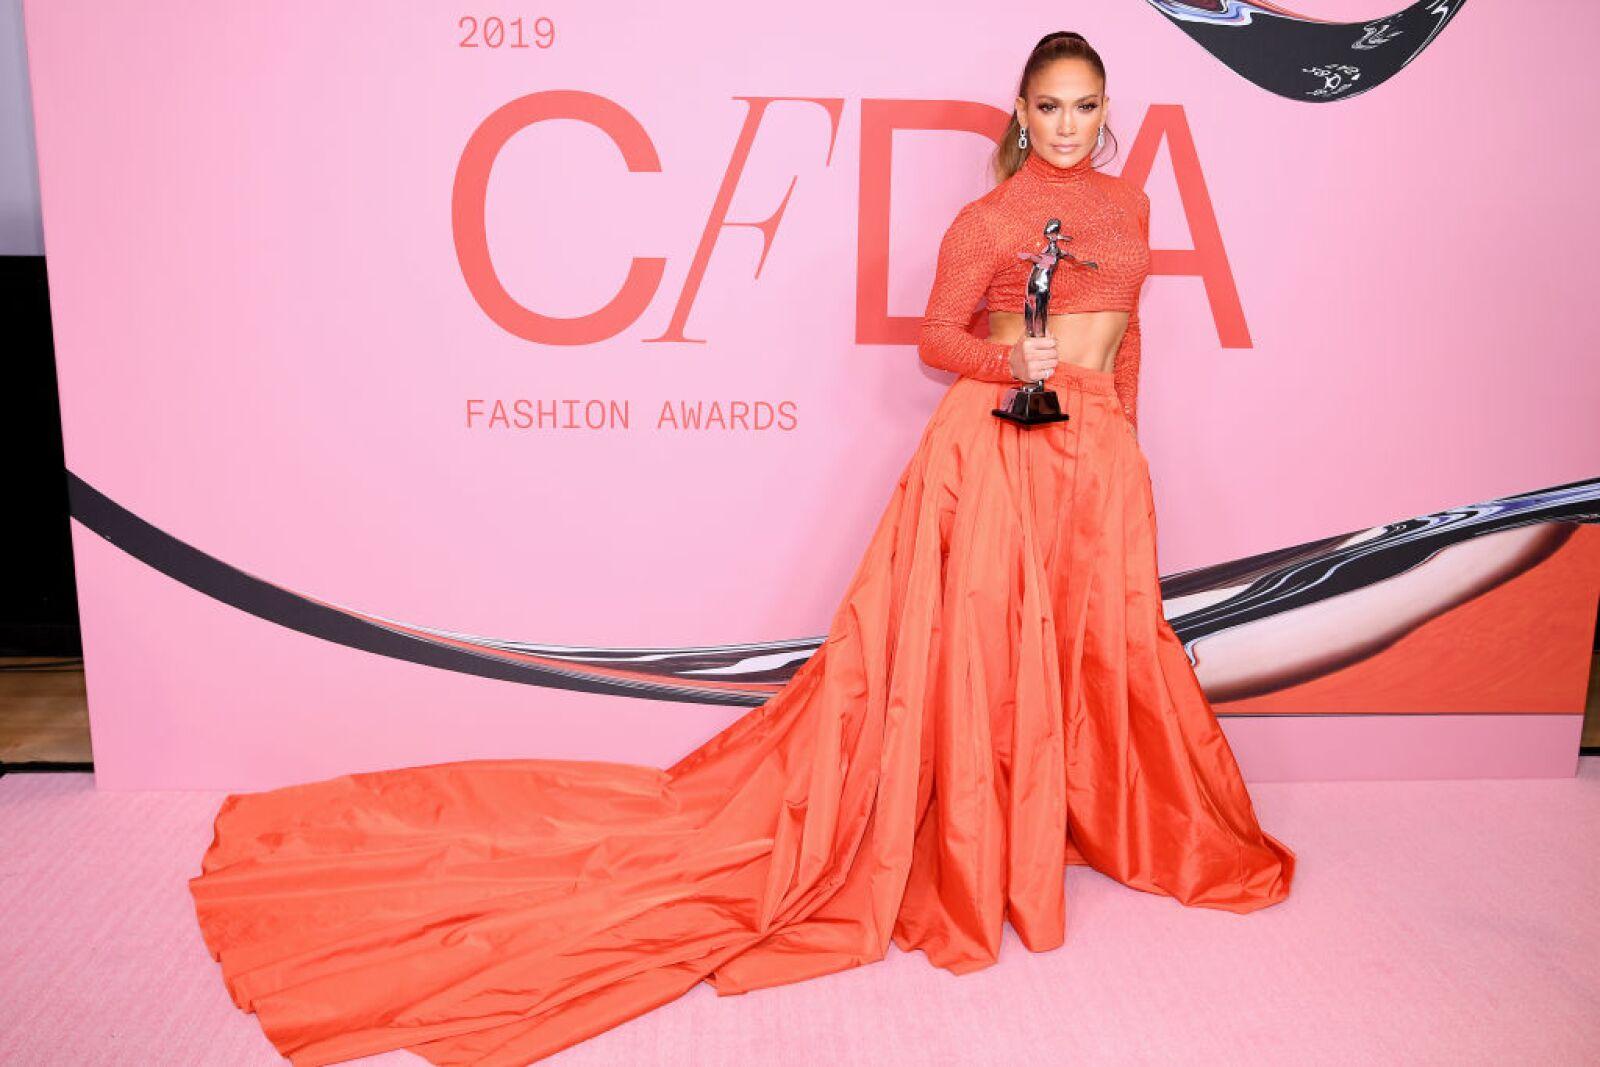 CFDA Fashion Awards - Winners Walk